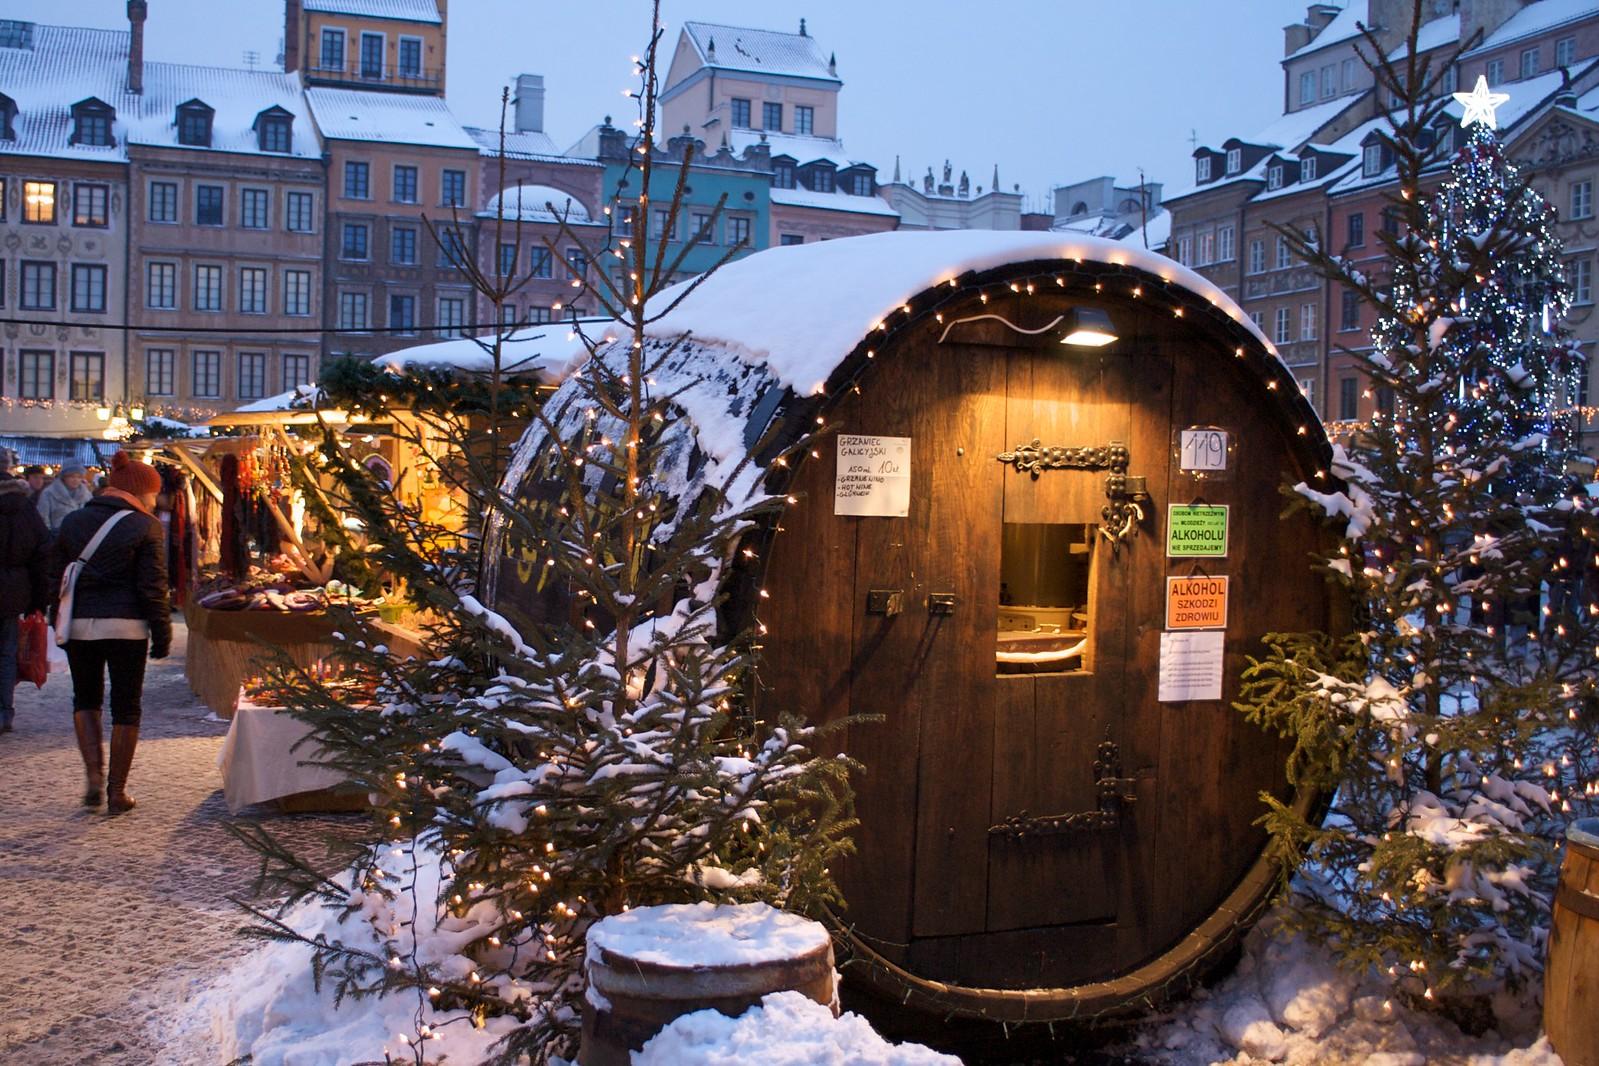 Christmas market in Warsaw, Poland. Credit Francois du Plessis